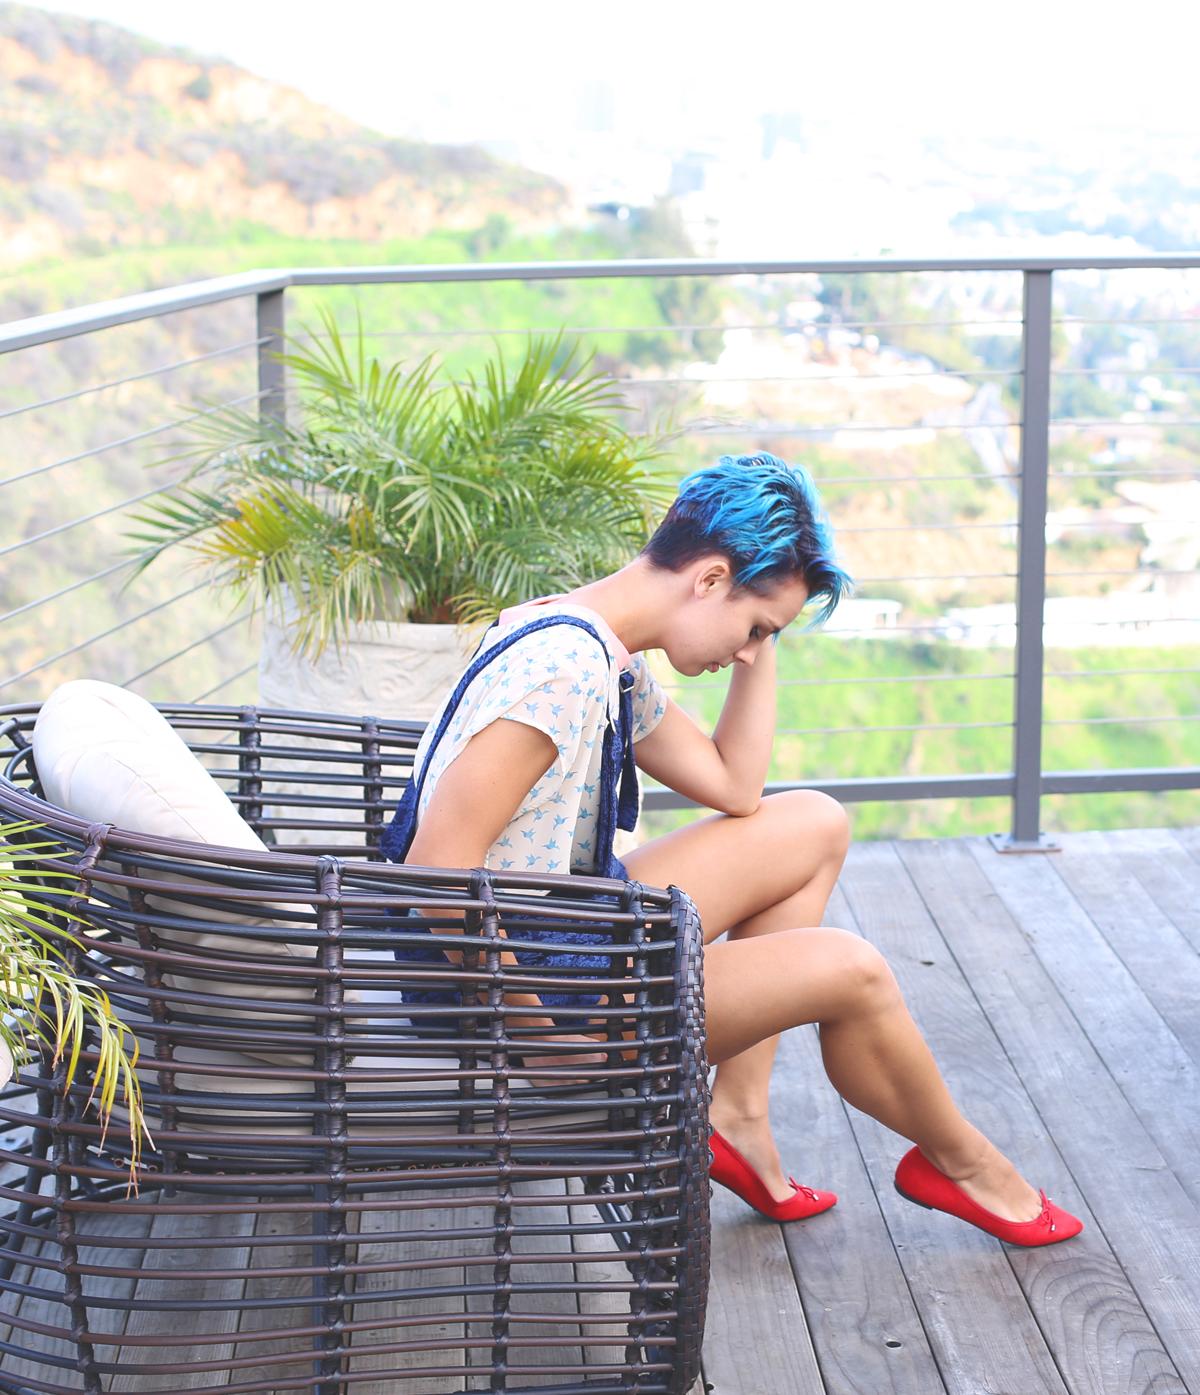 amy sitting overalls.jpg